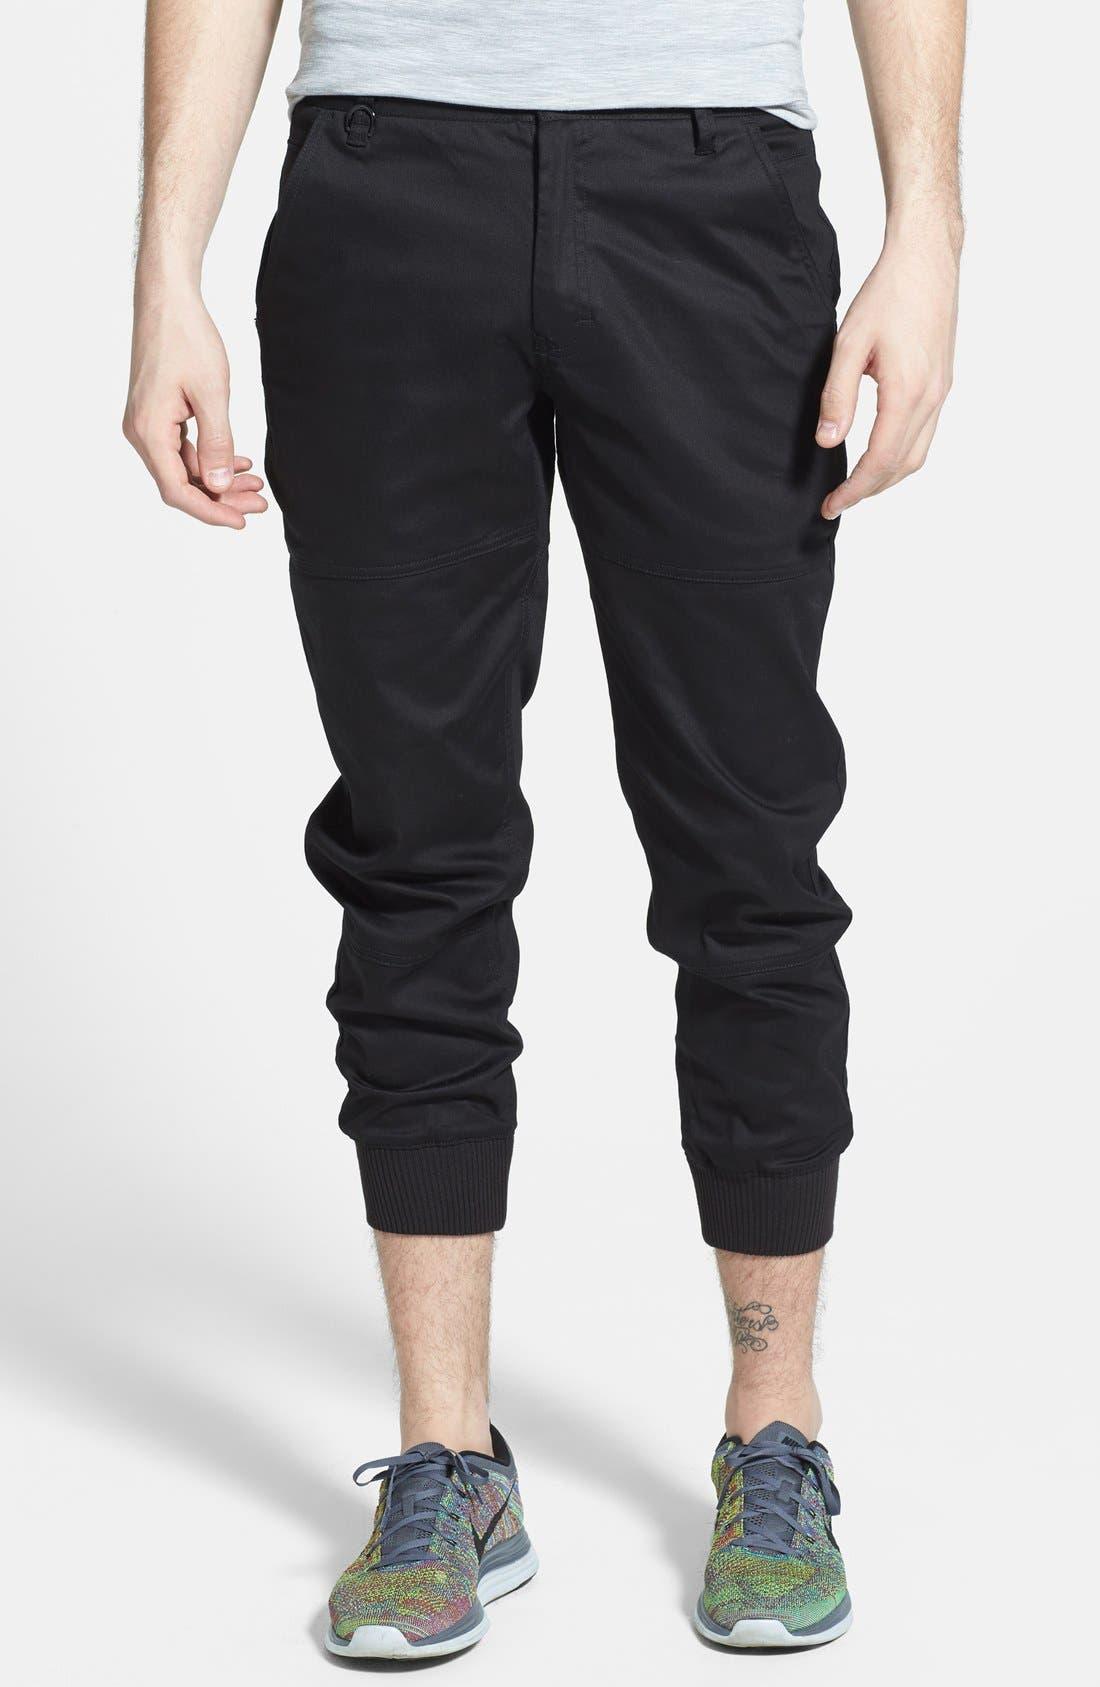 PUBLISH BRAND, 'Legacy' Tailored Fit Jogger Pants, Main thumbnail 1, color, 001